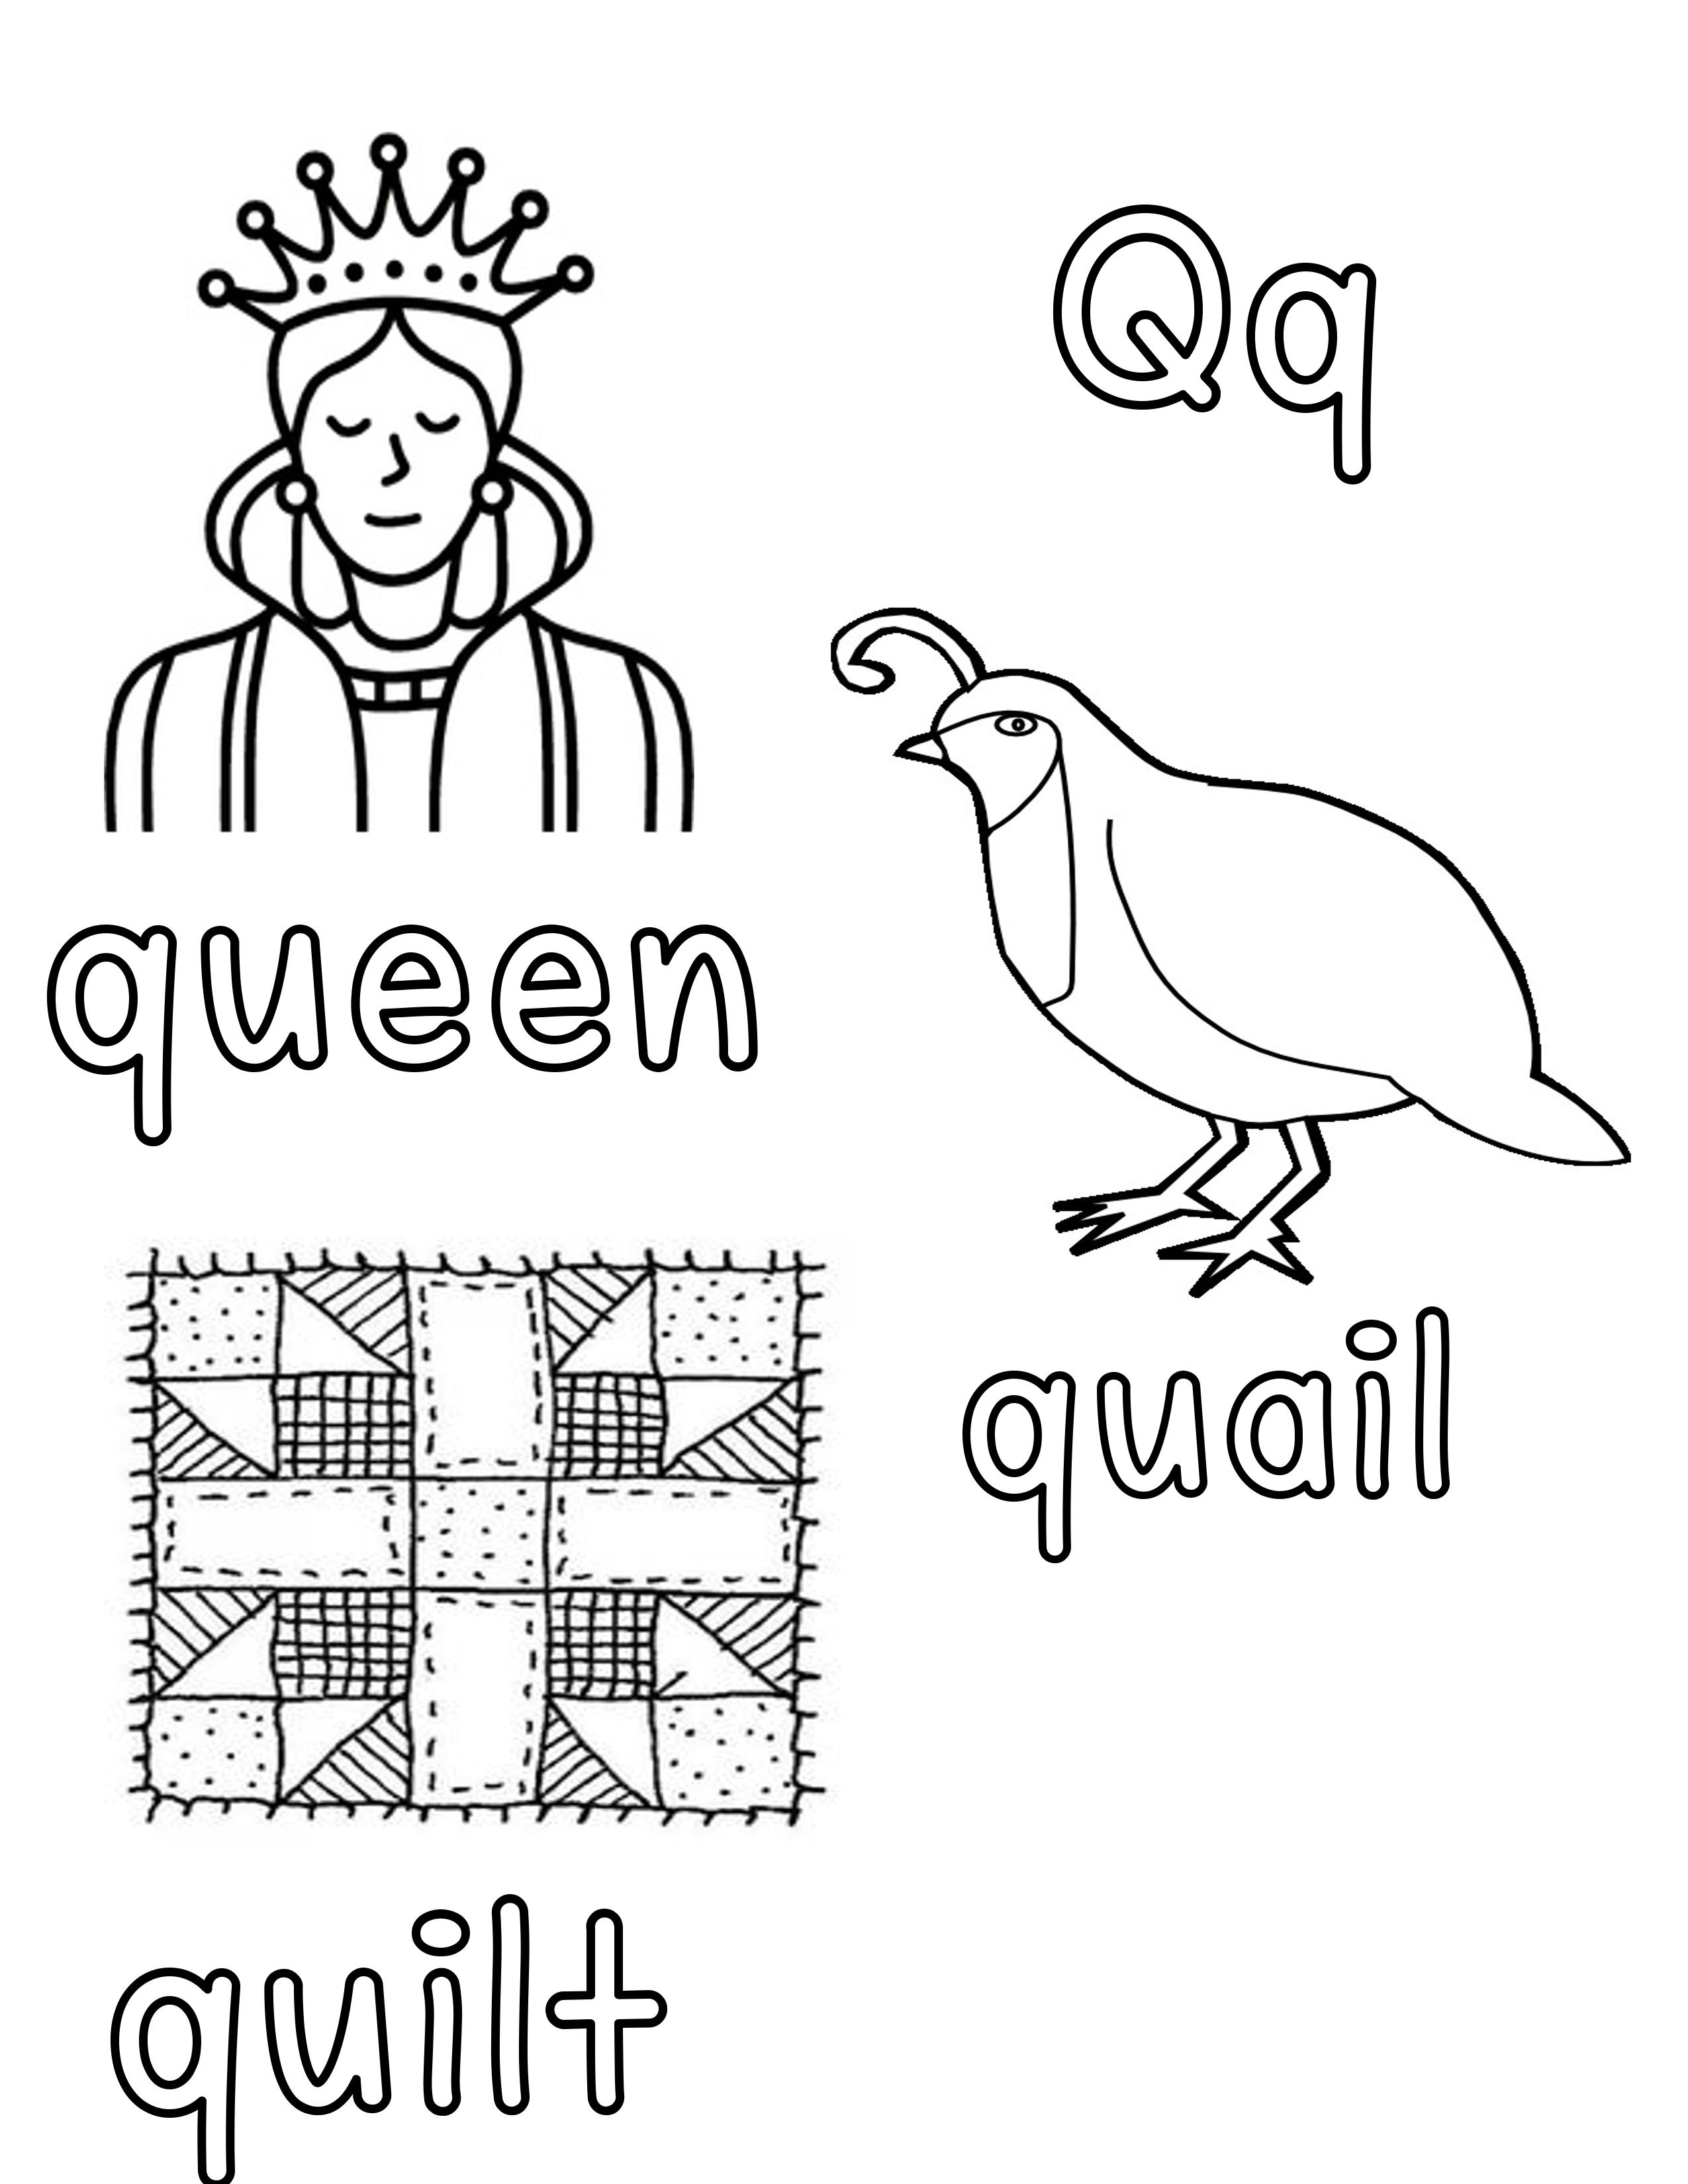 Phonetic Qq Coloring Sheet